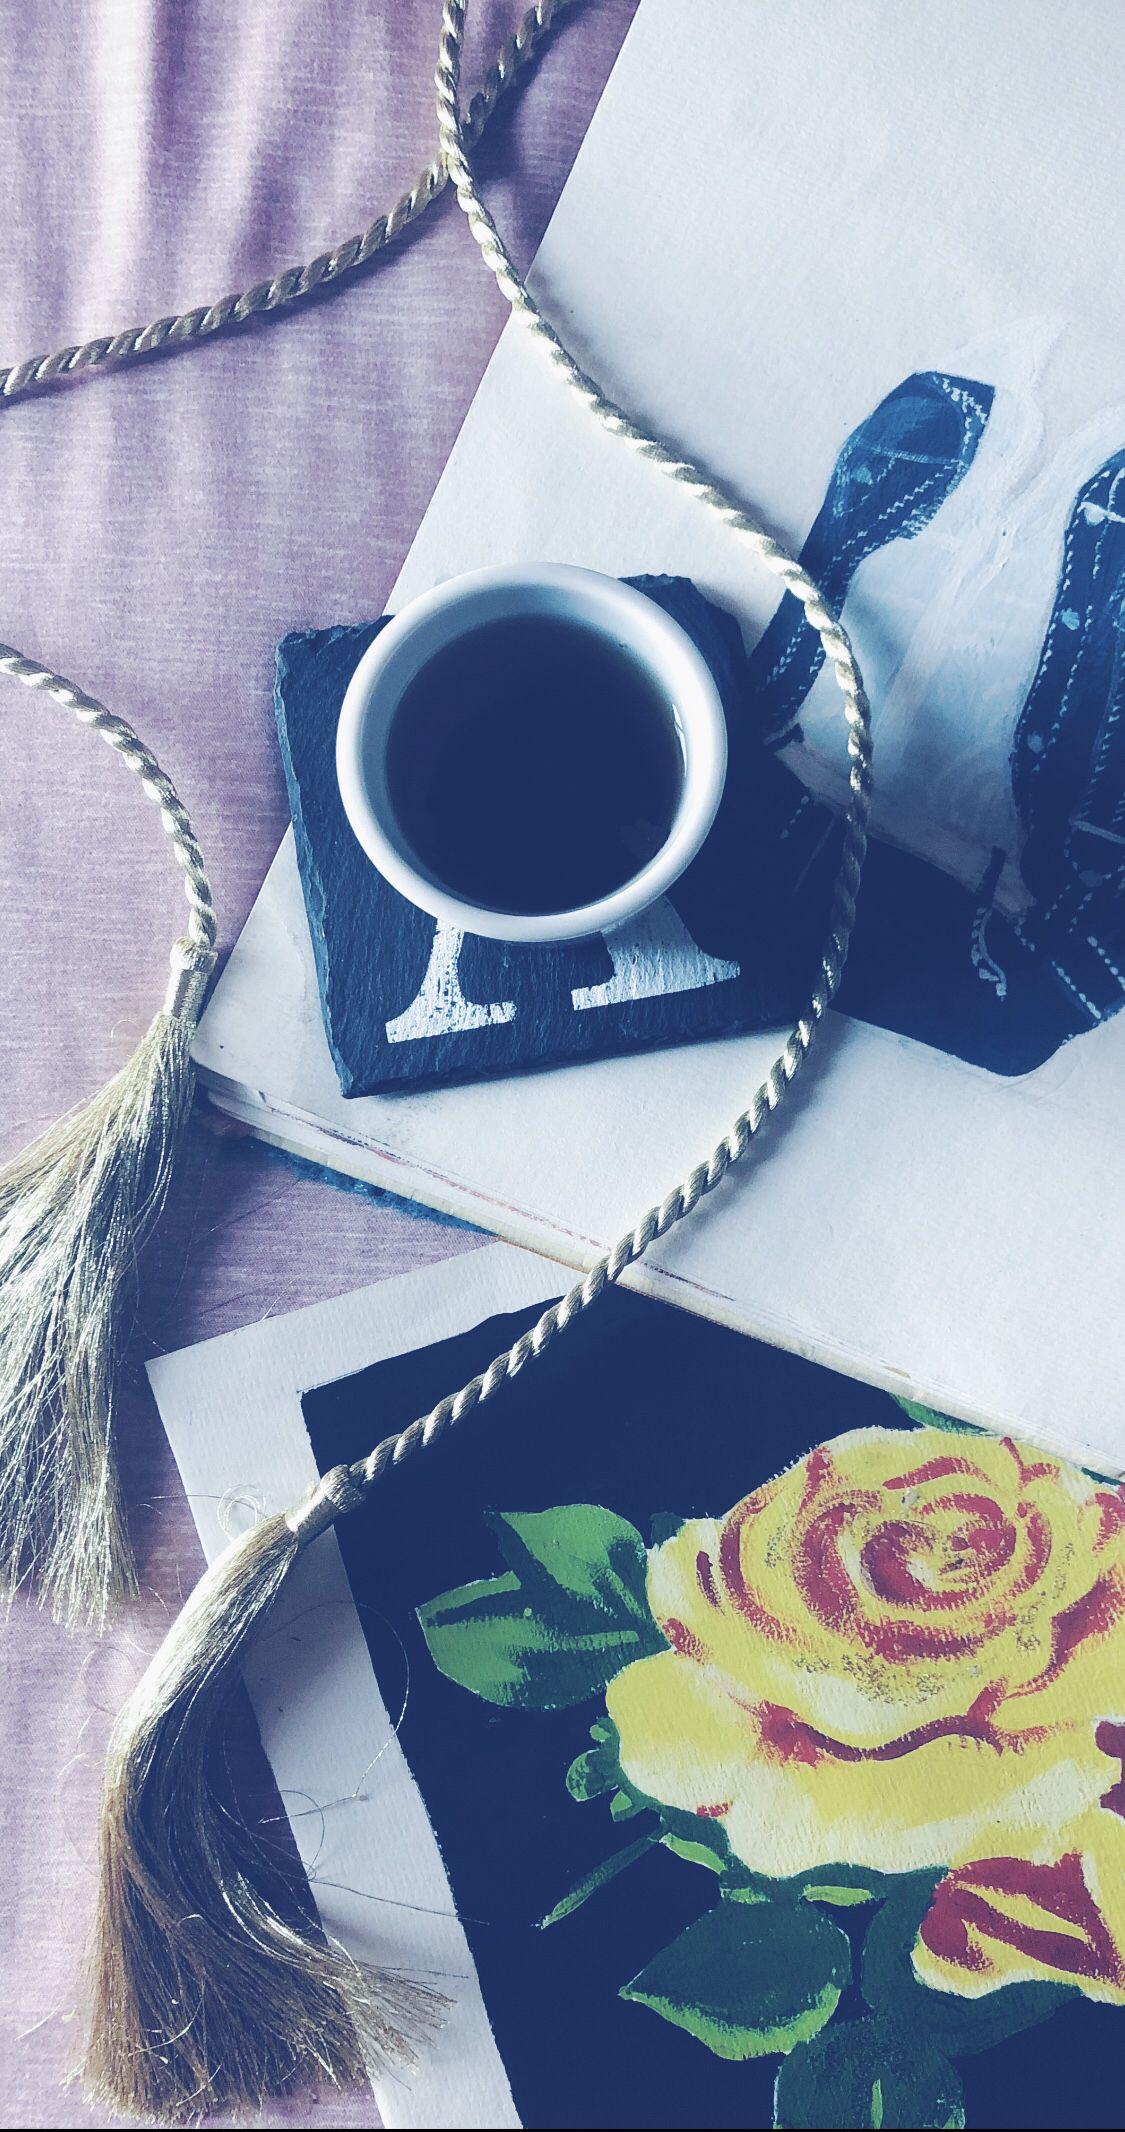 Drawings Art Design Photography Coffee رسم فن تصميم تصويري قهوة Art Design Art Design